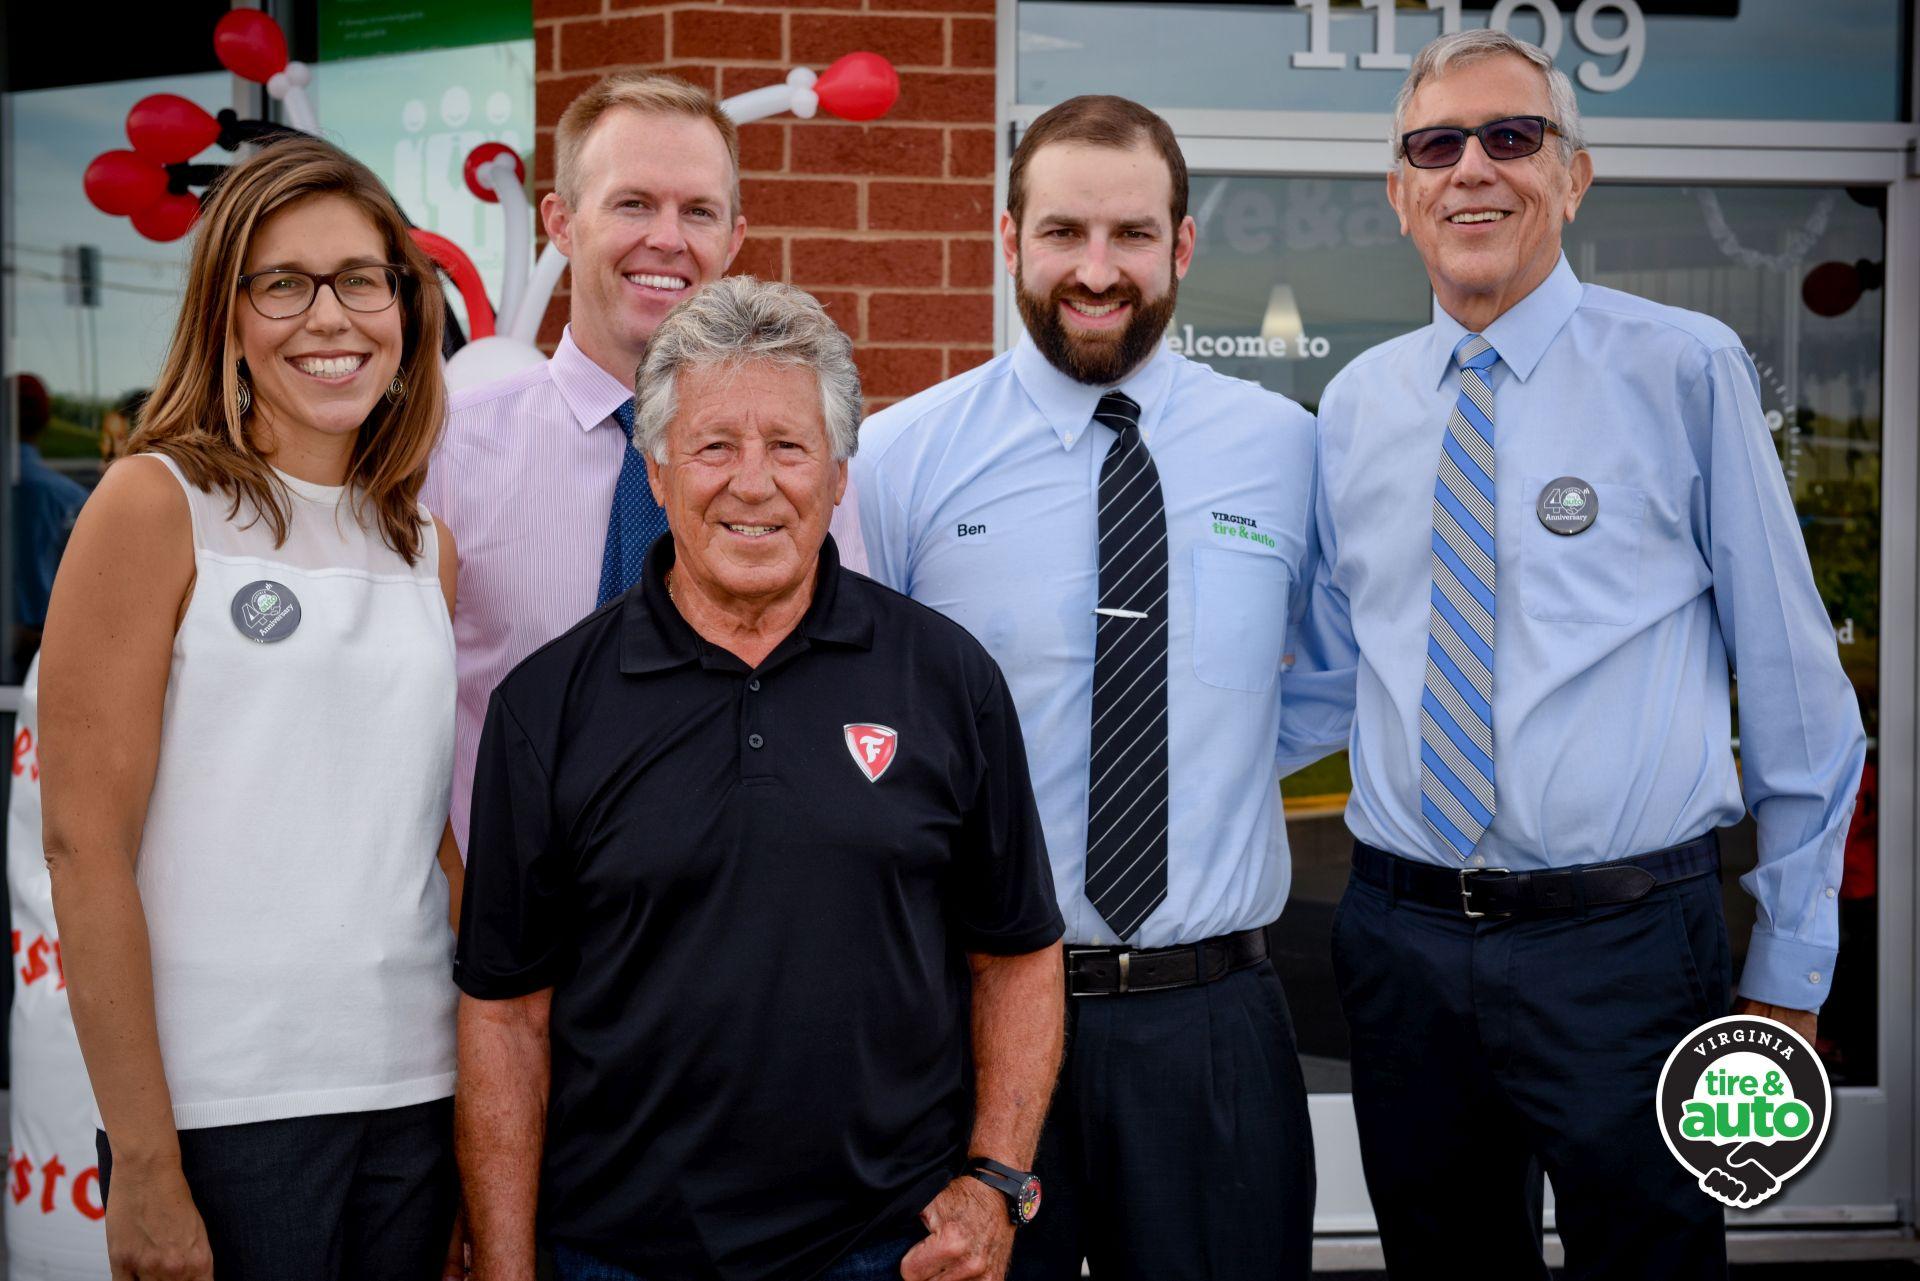 Photos: Grand Opening of Virginia Tire & Auto's Bristow Store